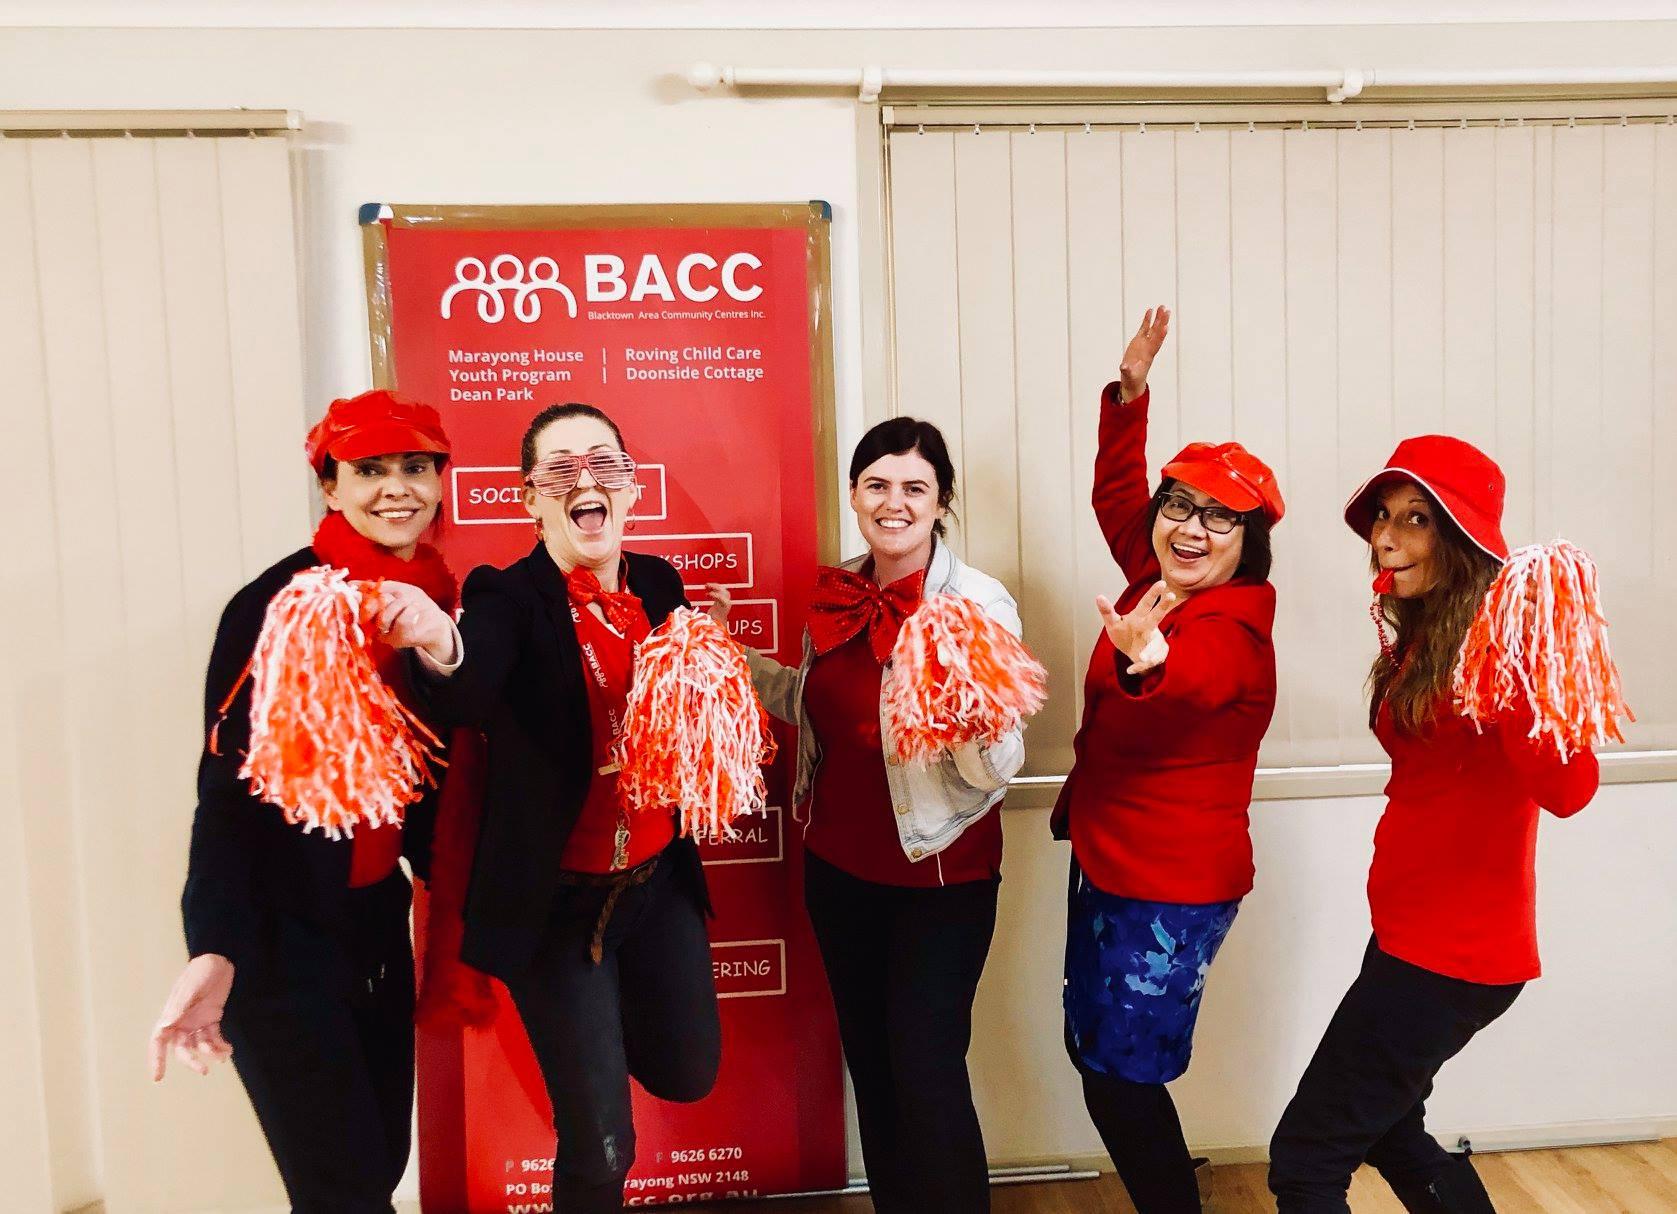 bacc-staff